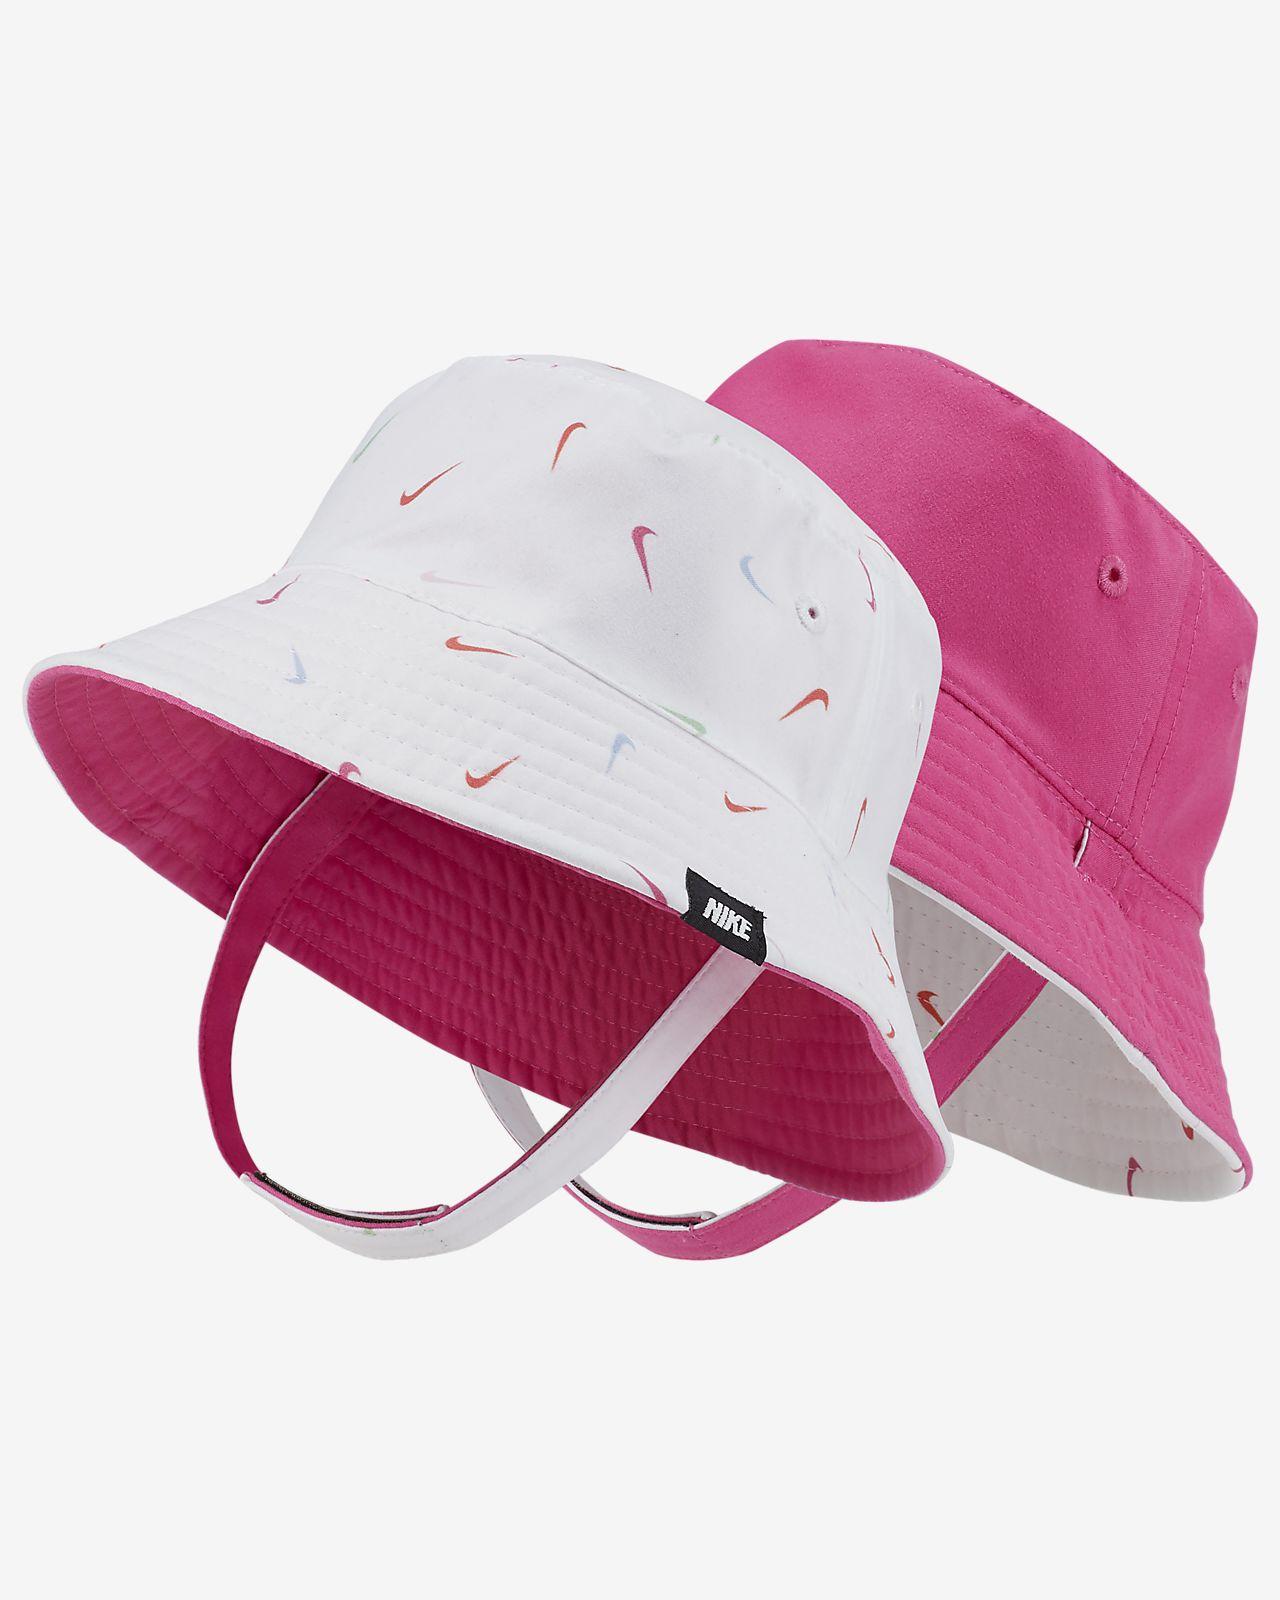 4c427829ae51c Low Resolution Nike Dri-FIT Toddler Reversible Bucket Hat Nike Dri-FIT  Toddler Reversible Bucket Hat